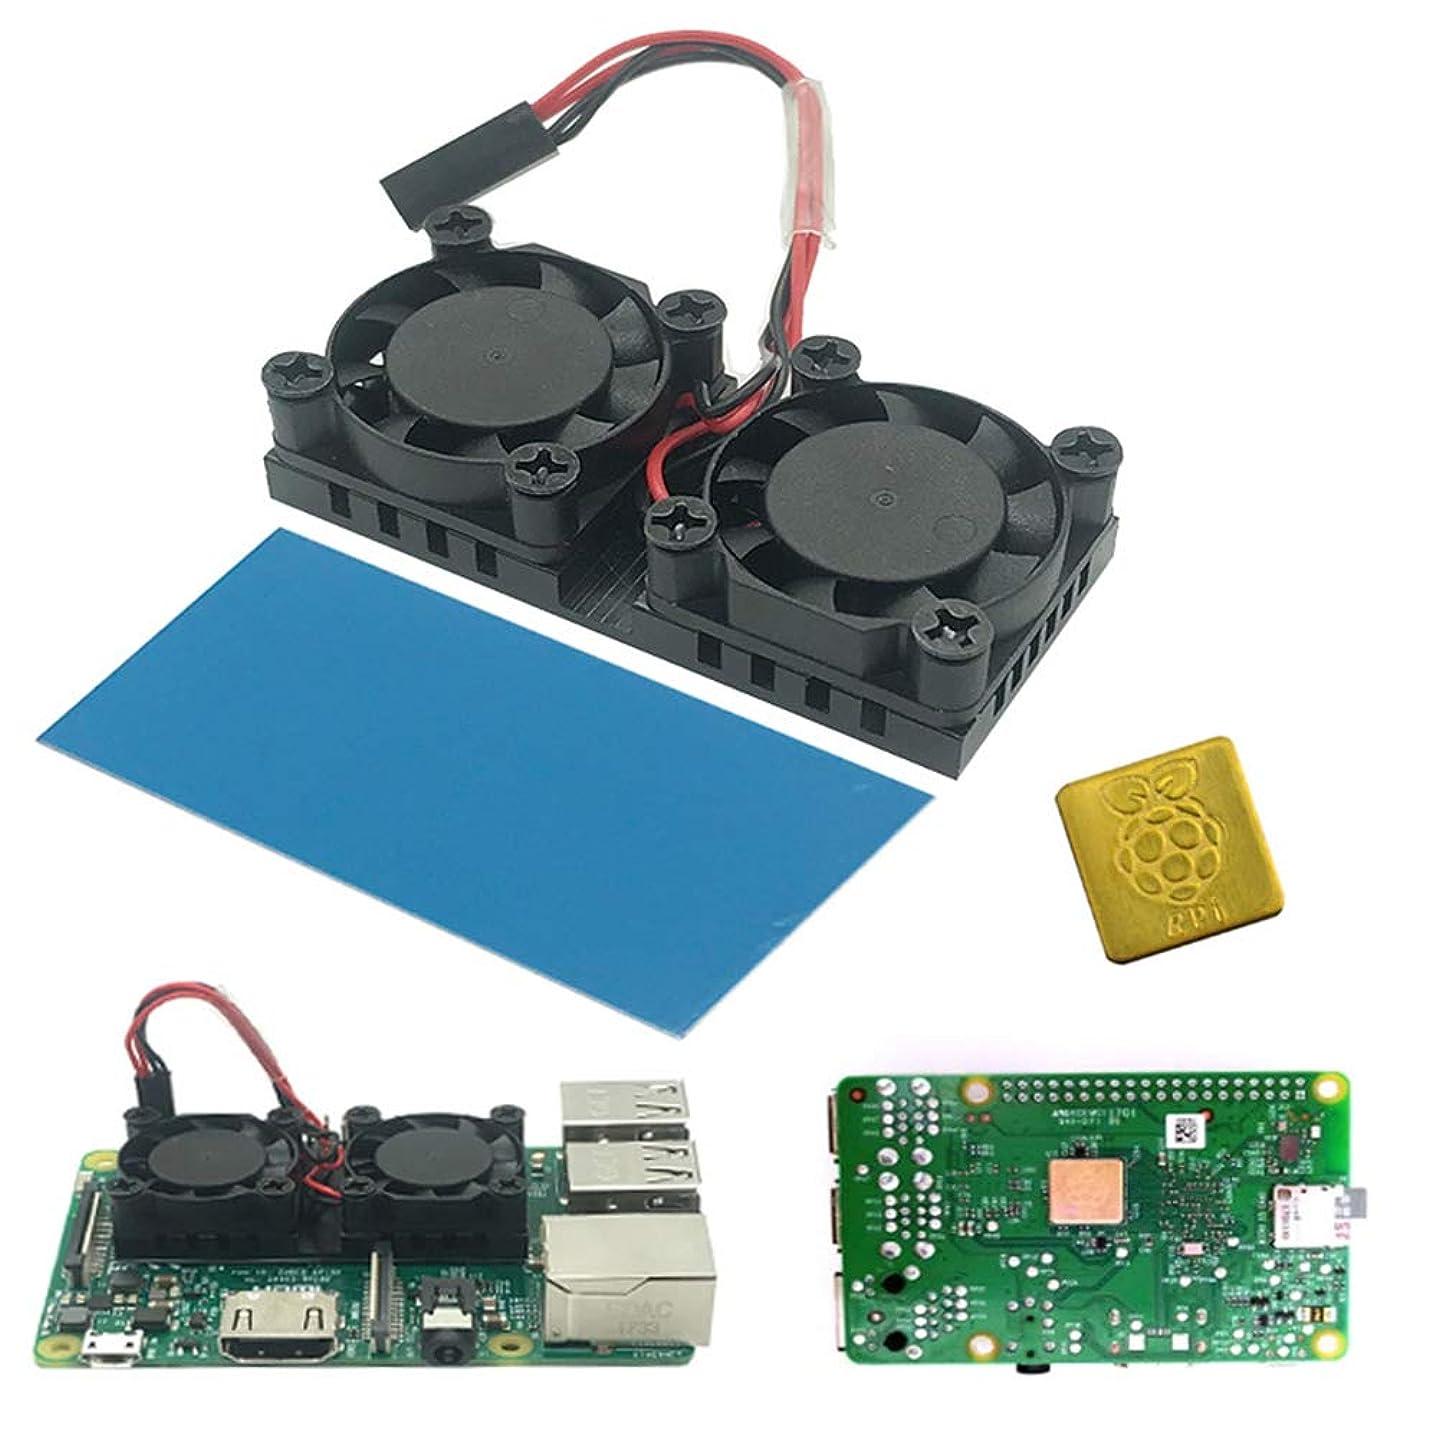 putdWH99 Cooling Fan for Computer | Heat Dissipation Dual Cooling Fan Heatsink Cooler Module for Raspberry Pi 1/2/3B